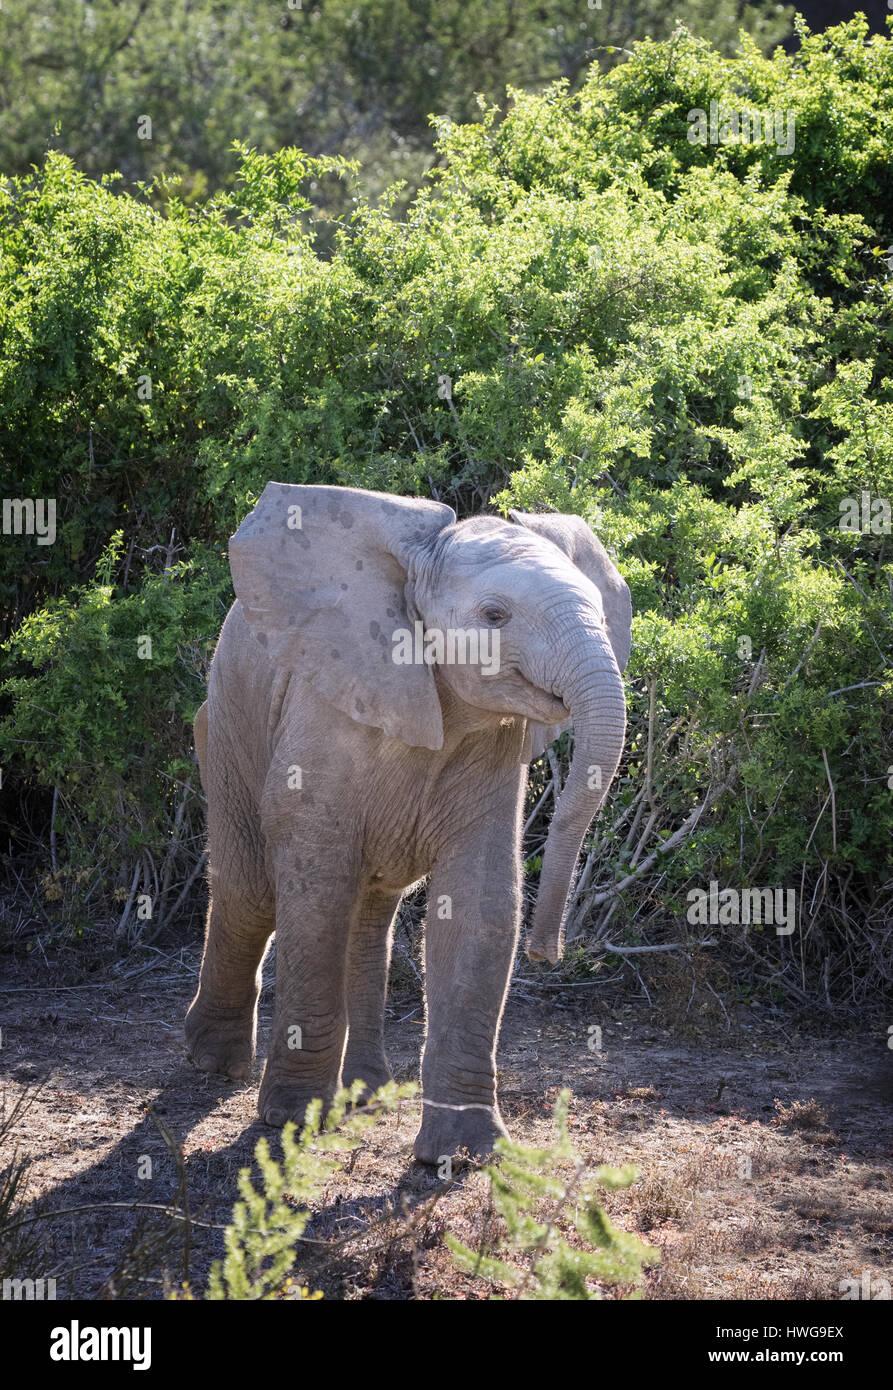 baby-elephant-african-elephant-loxodonta-africana-south-africa-HWG9EX.jpg